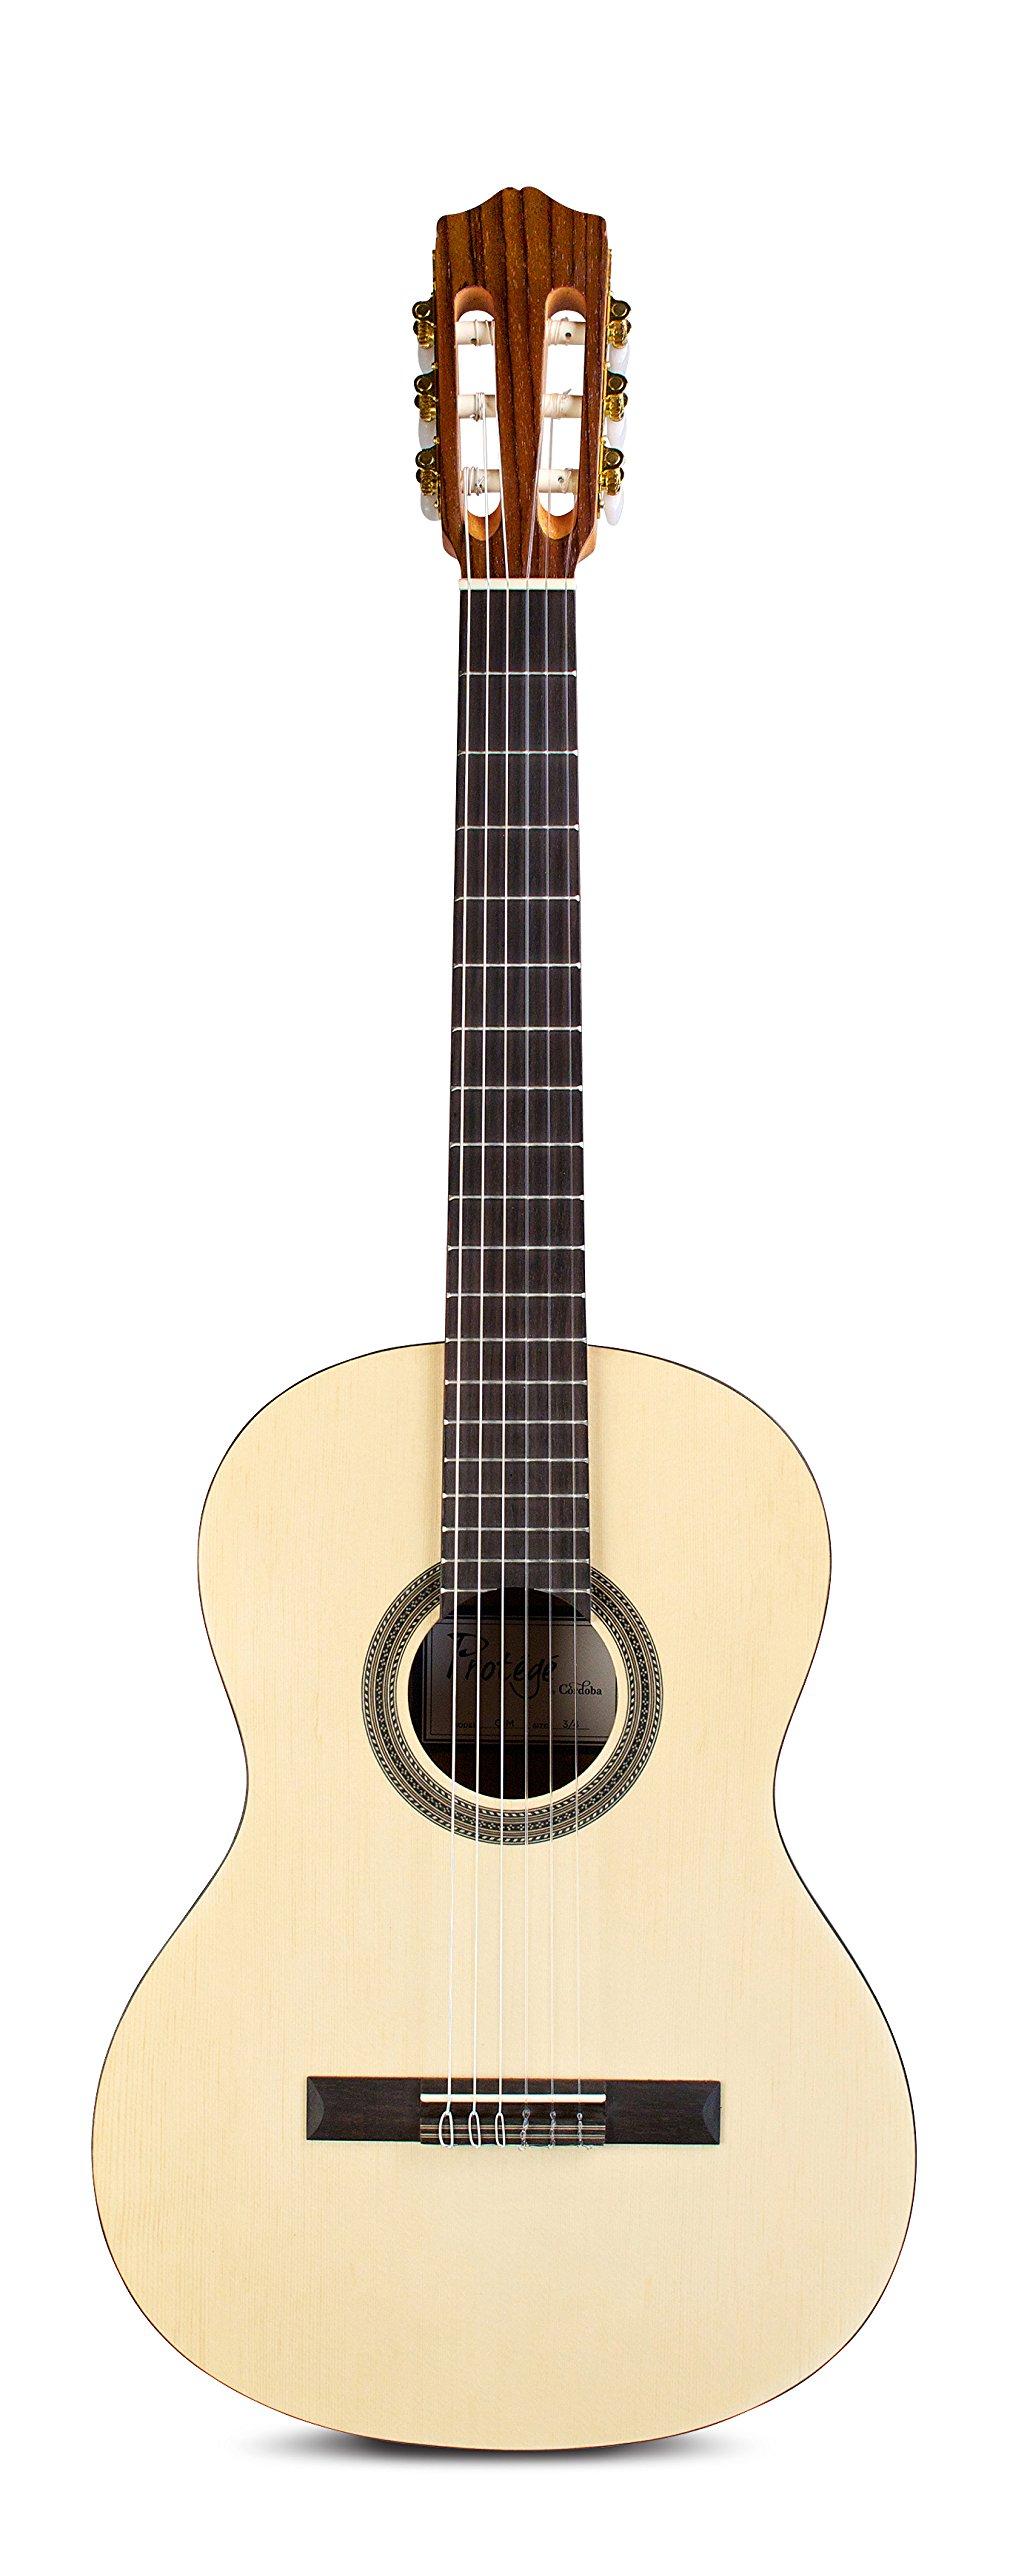 Cordoba Guitars C1M 3/4 Acoustic Nylon String Guitar, 3/4 size